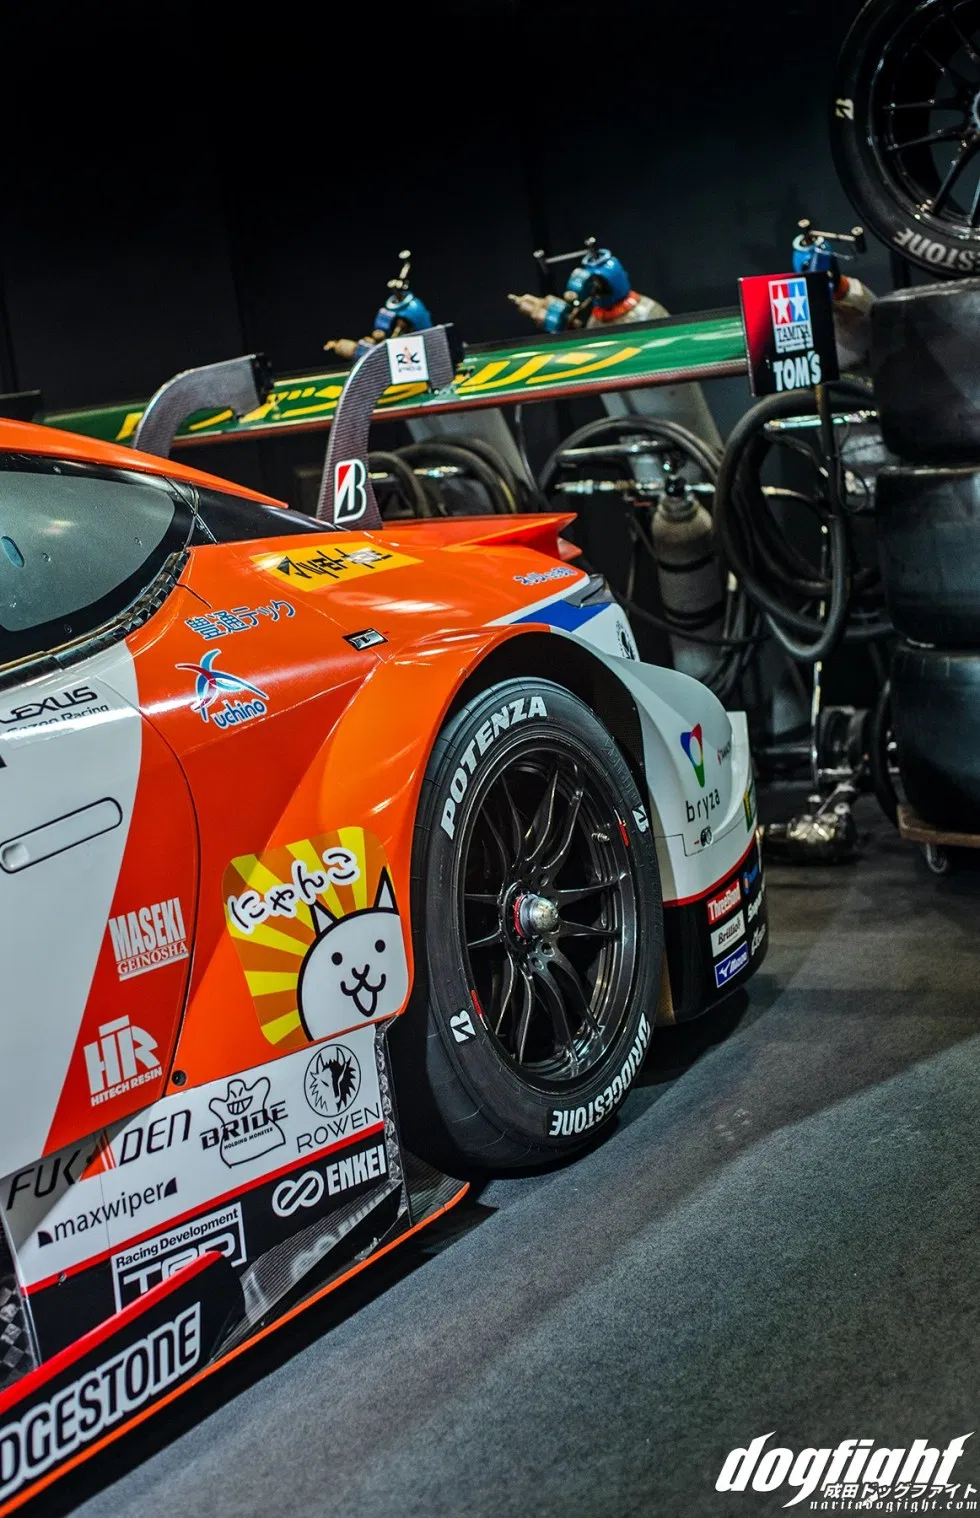 Event Super Gt Display Tokyo Auto Salon 2020 V 2 In 2020 Win Car Nsx Gt Tokyo